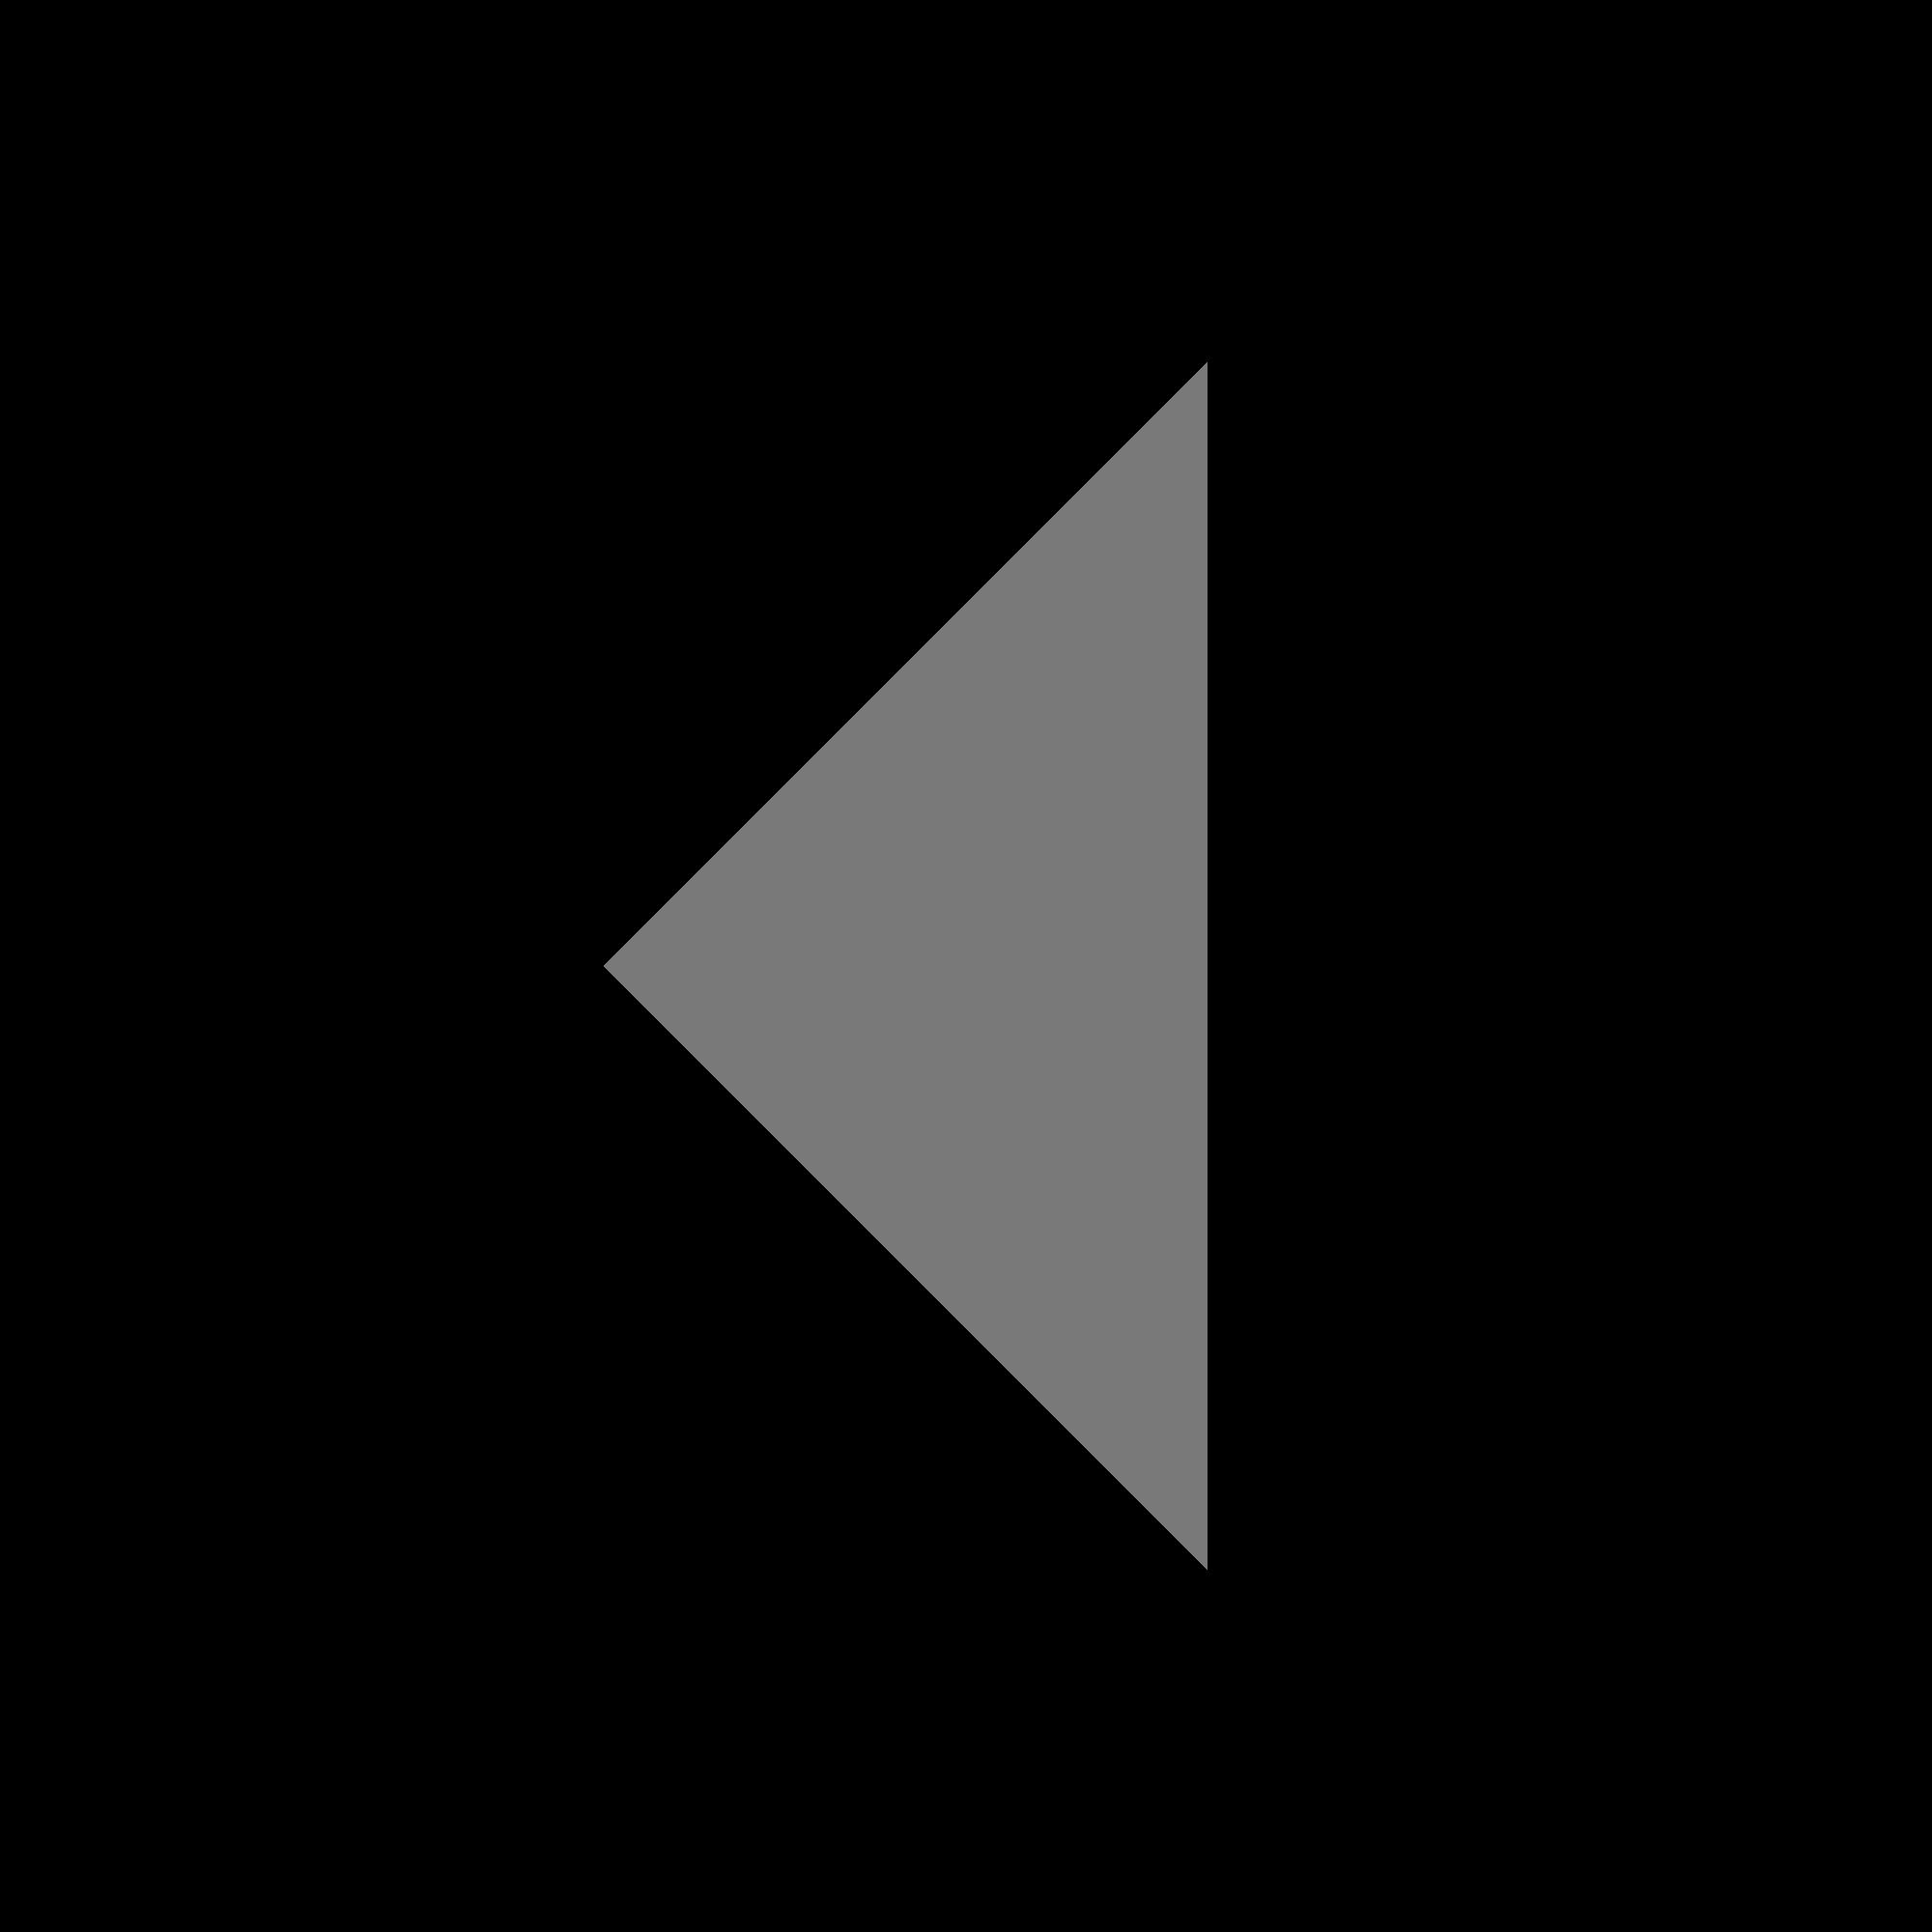 New SVG image - Left Arrow PNG